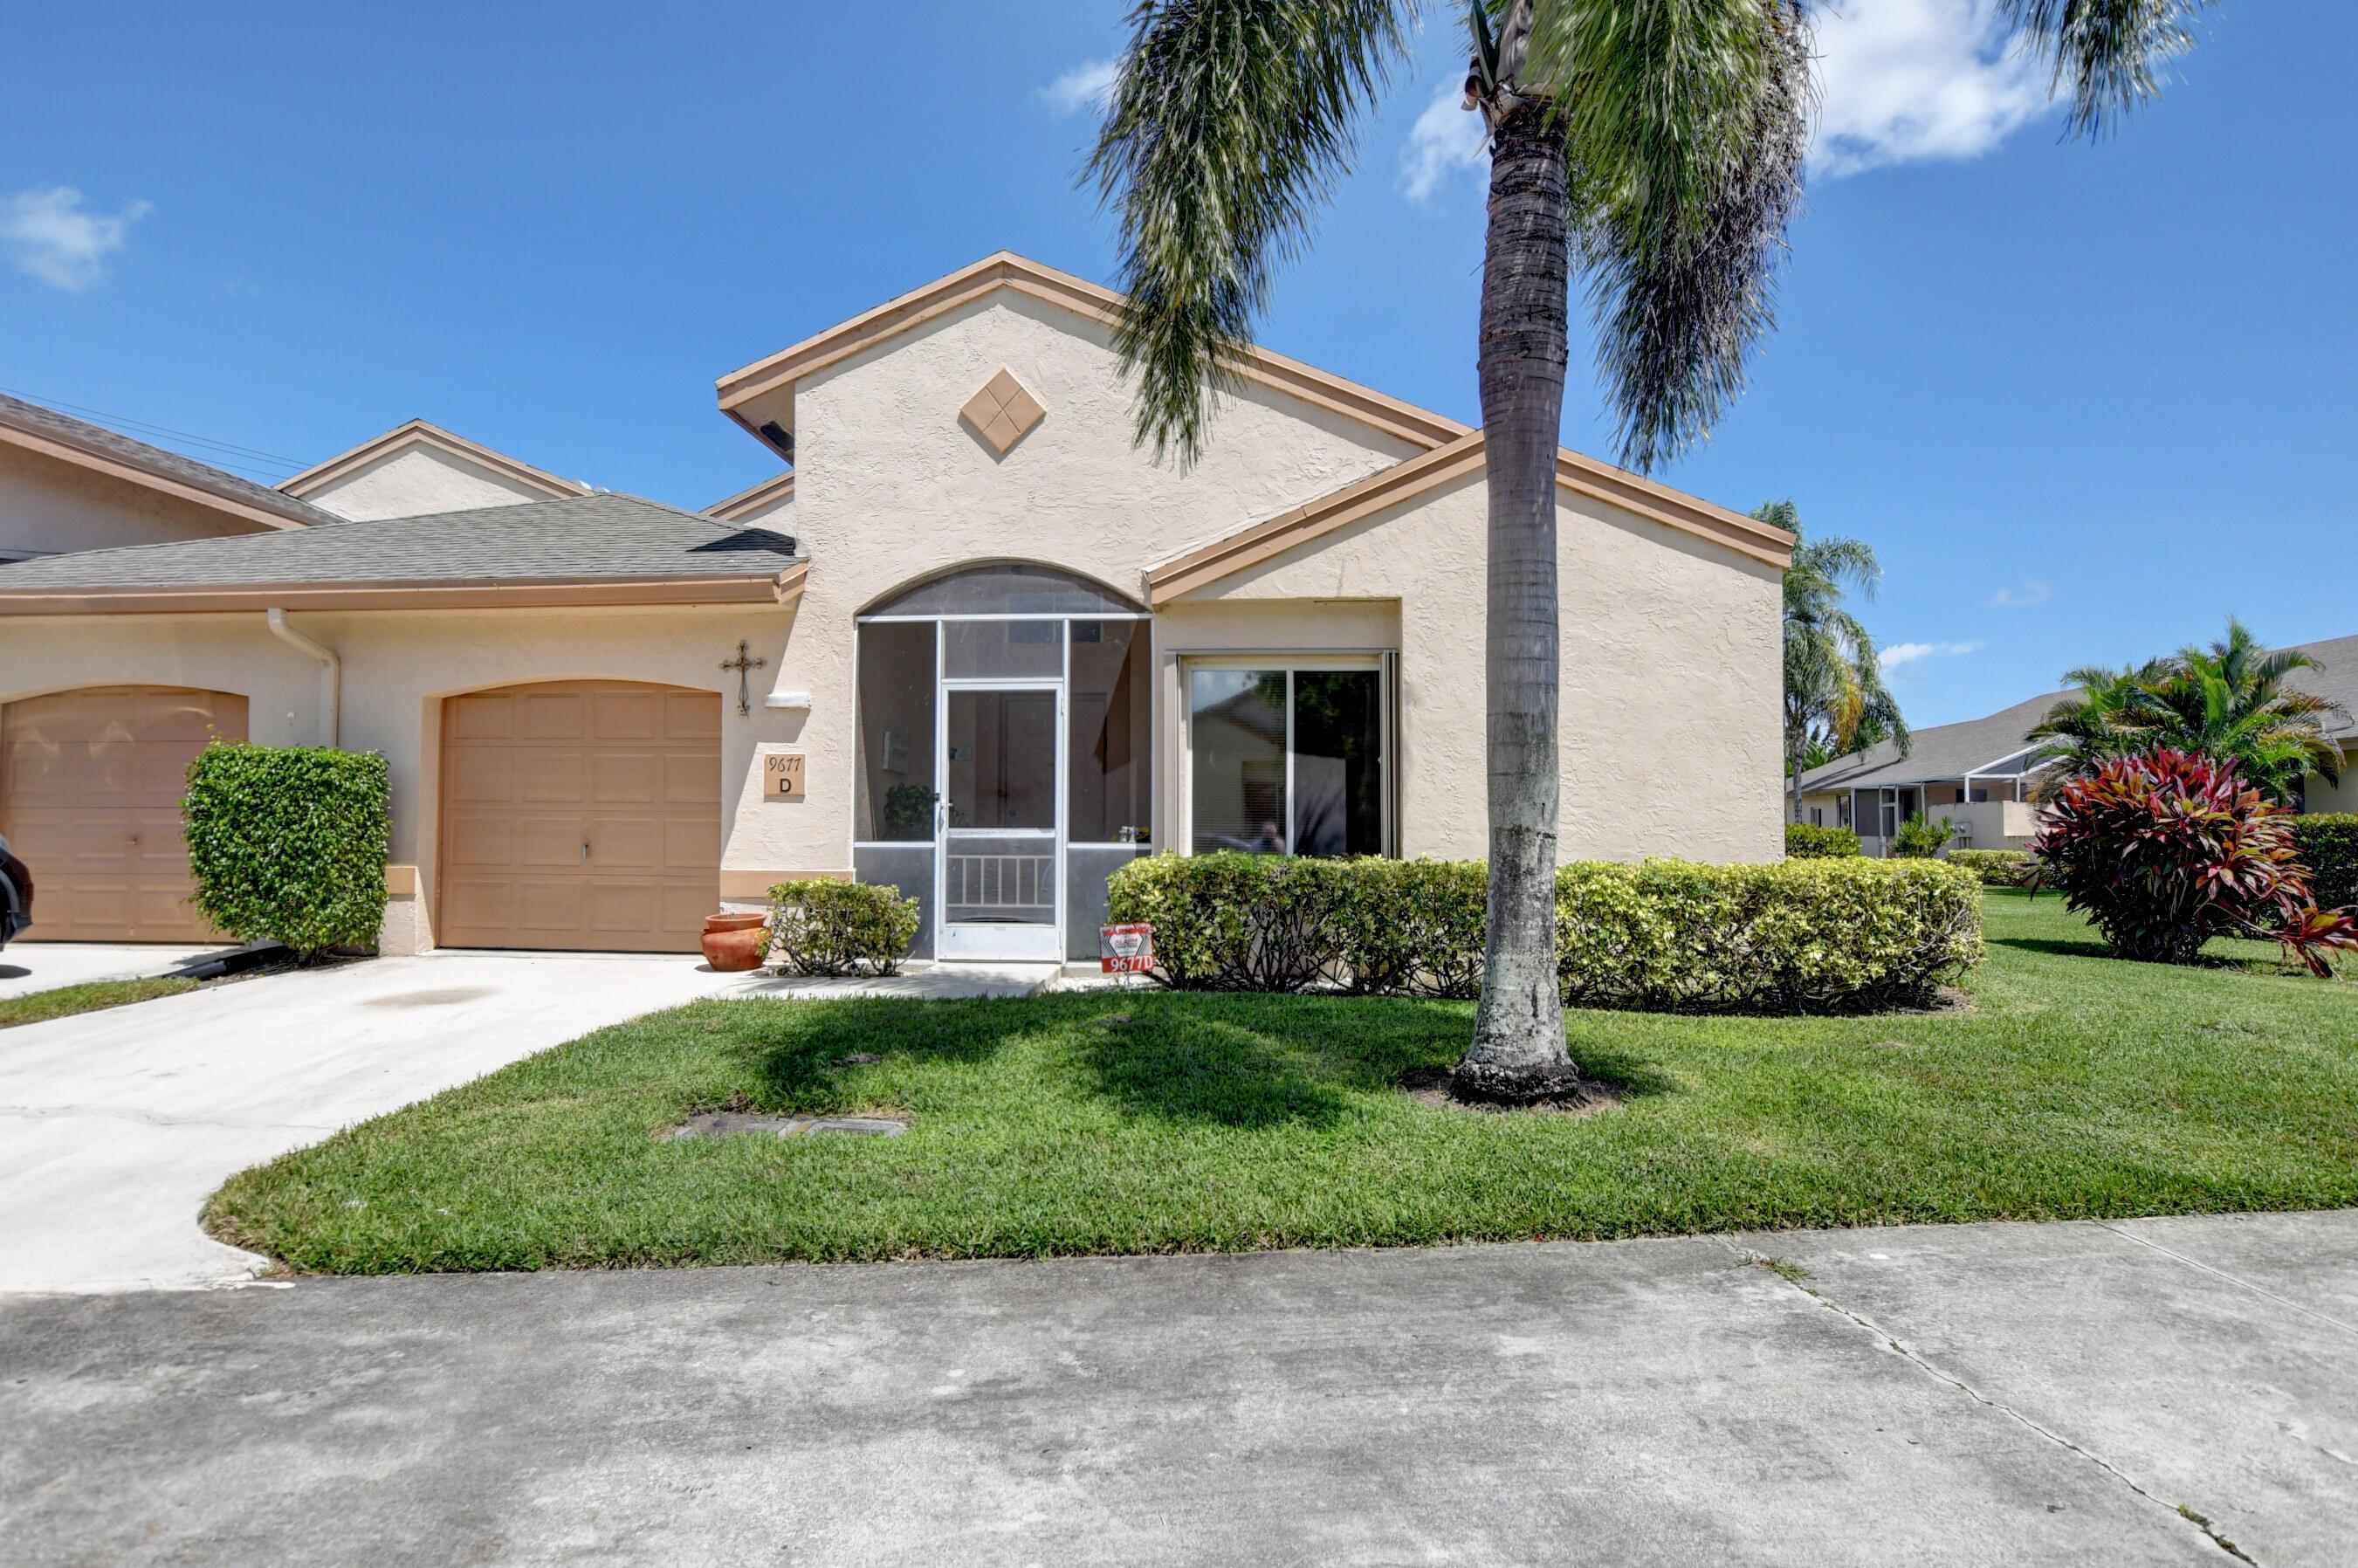 9677  Boca Gardens Circle D For Sale 10746680, FL